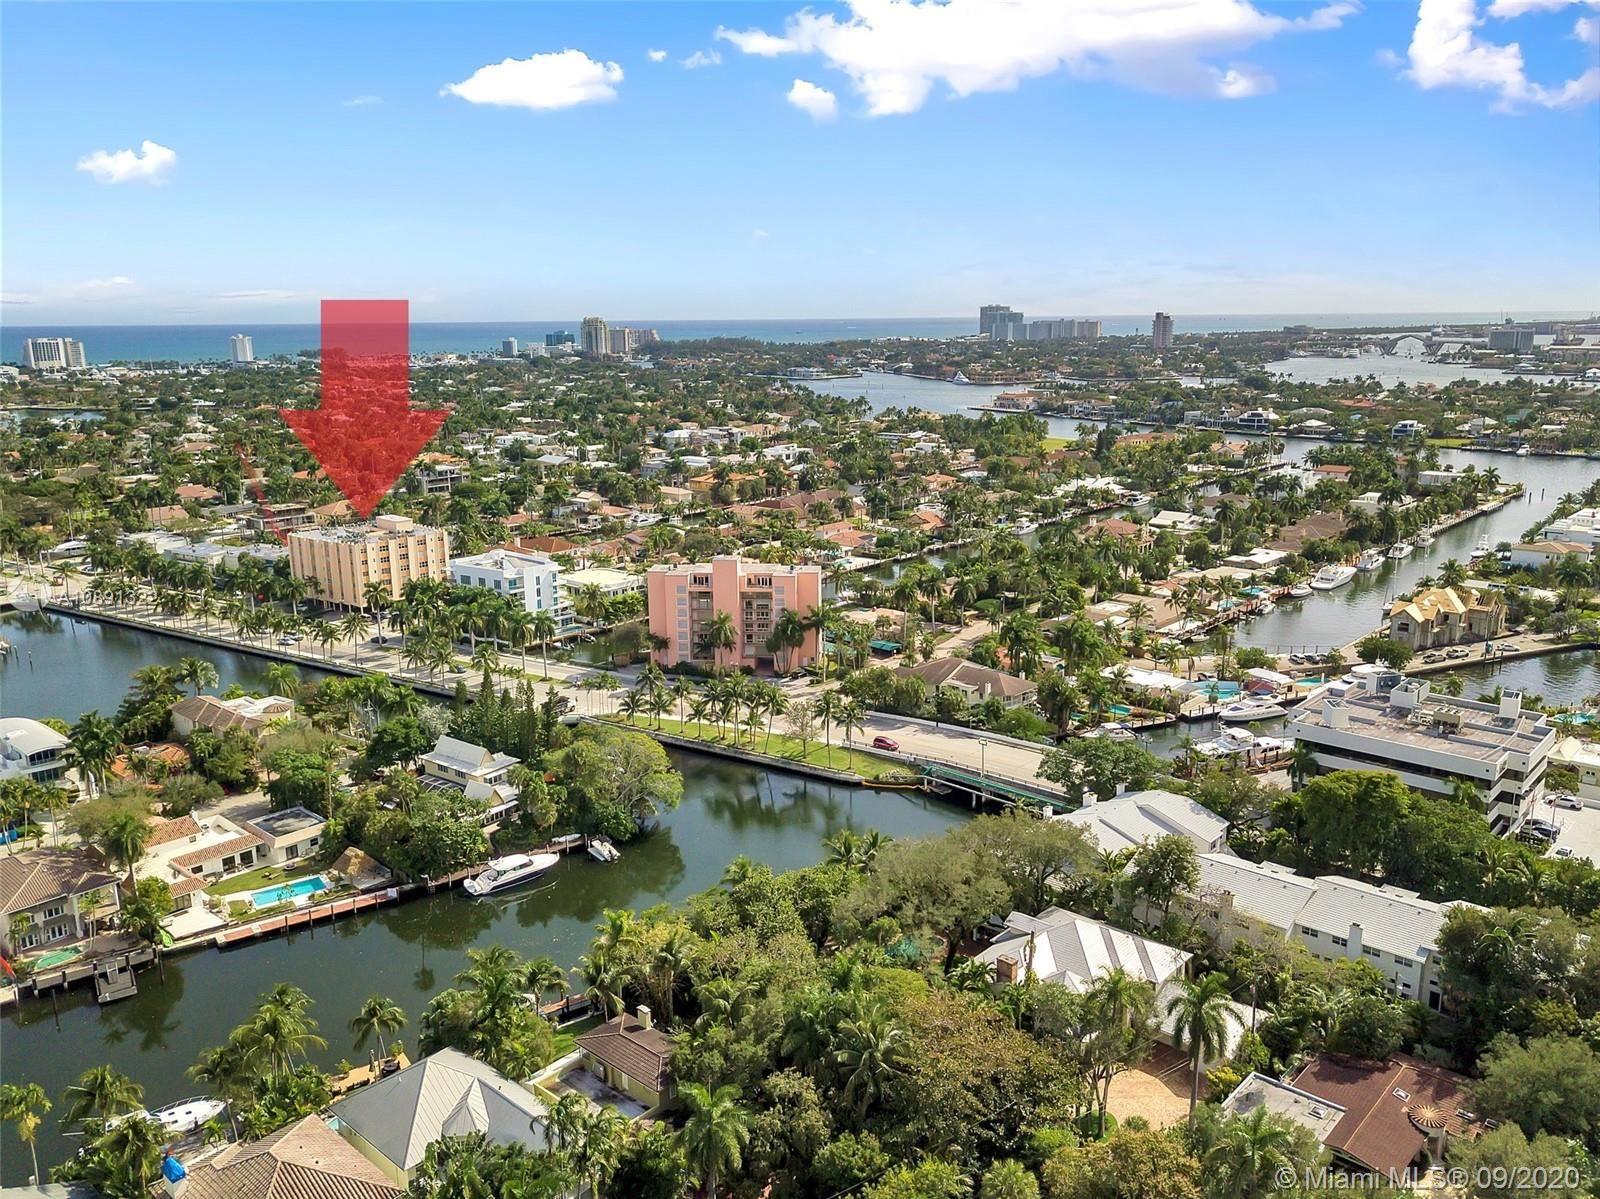 Photo of 1770 E Las Olas Blvd #307, Fort Lauderdale, FL 33301 (MLS # A10891322)